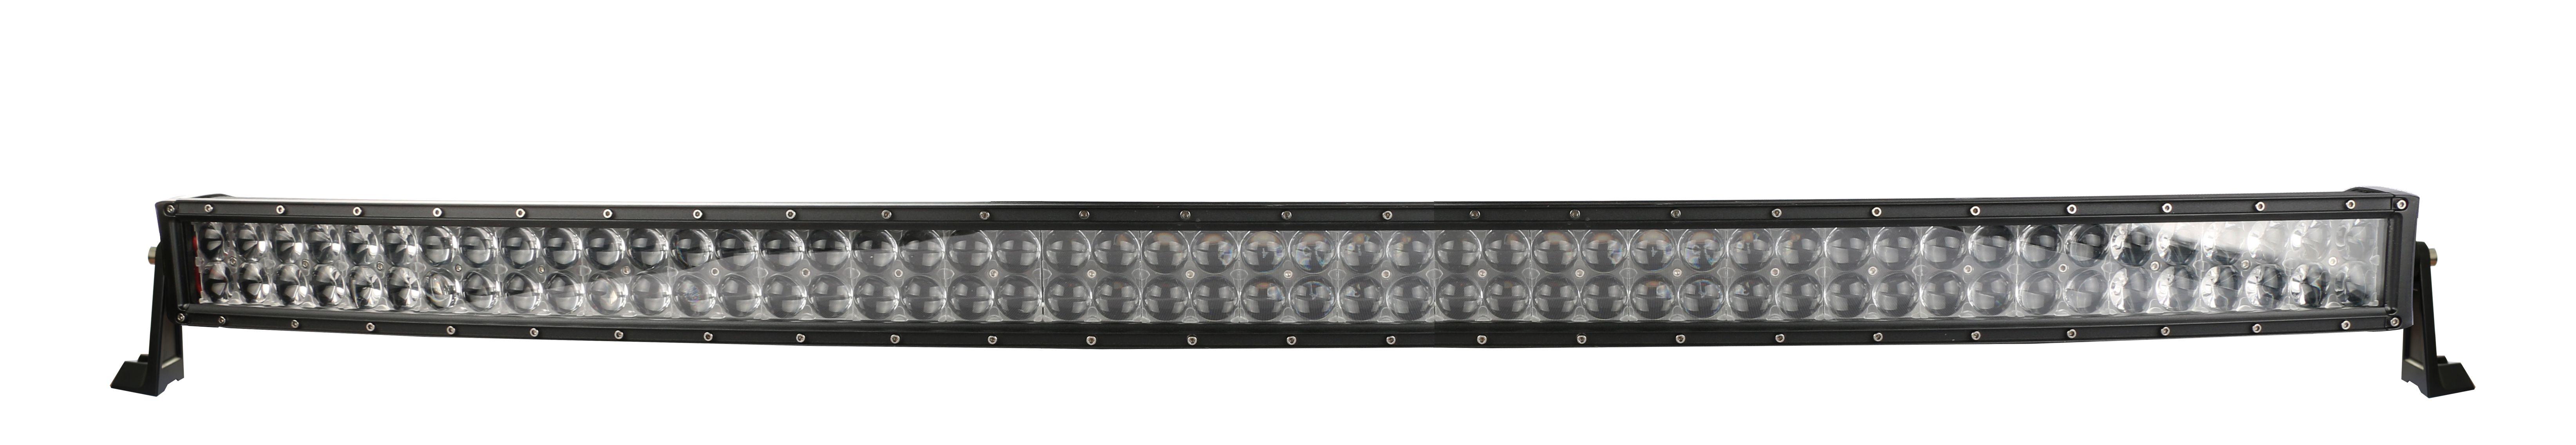 42 '' LED بار منحني 240W 42 بوصة LED ضوء بار شاحنة SUV JEEP ATV معطلة 4X4 الطريق 12V 24V كومبو بقعة الفيضانات 80X3W LED ضوء العمل